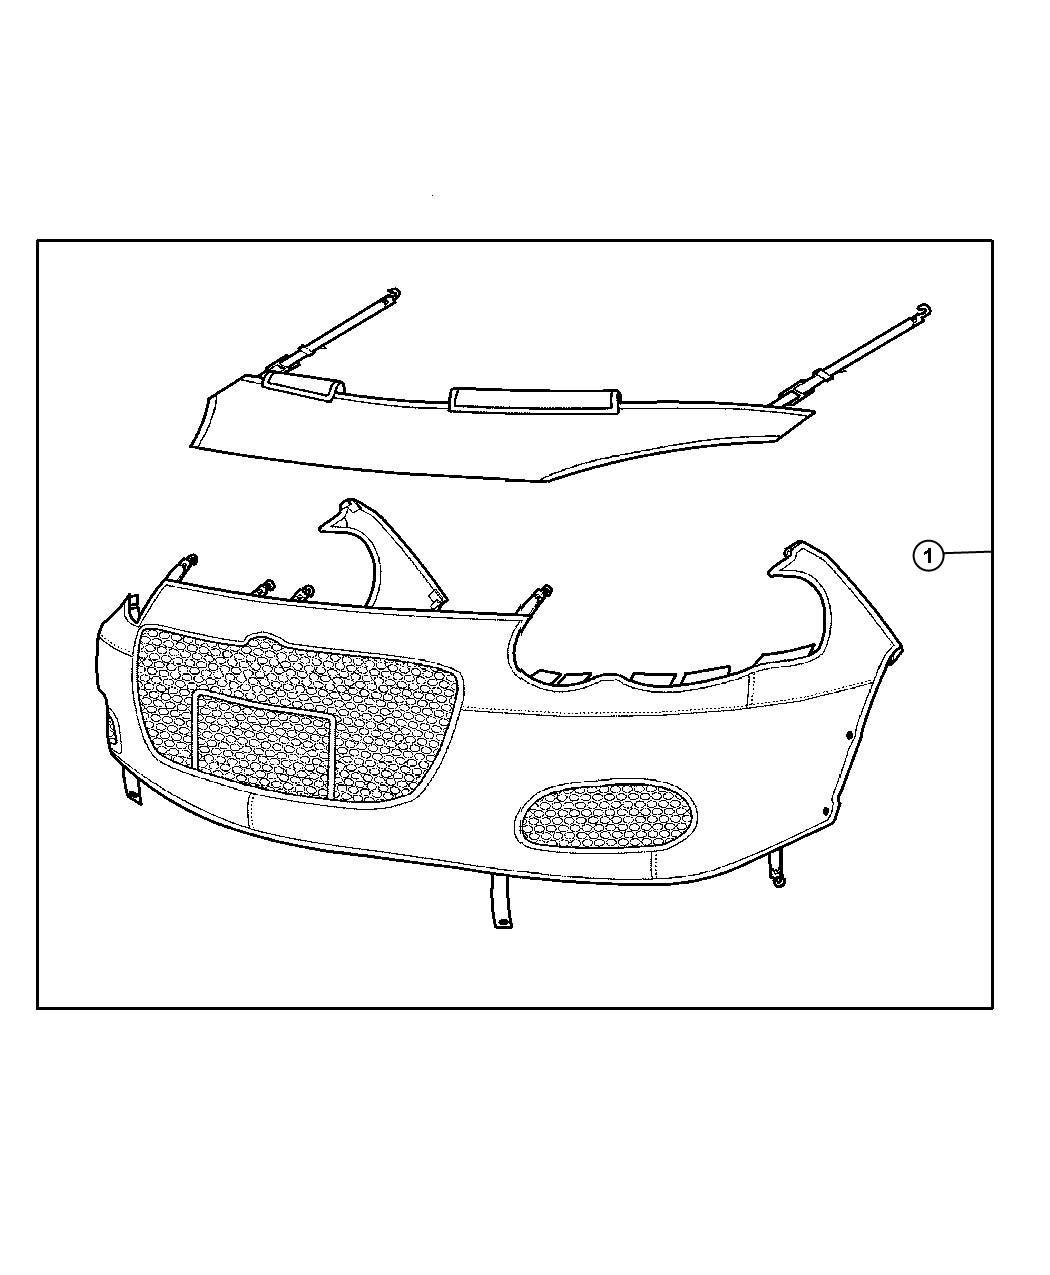 Dodge Stratus Hardware Kit